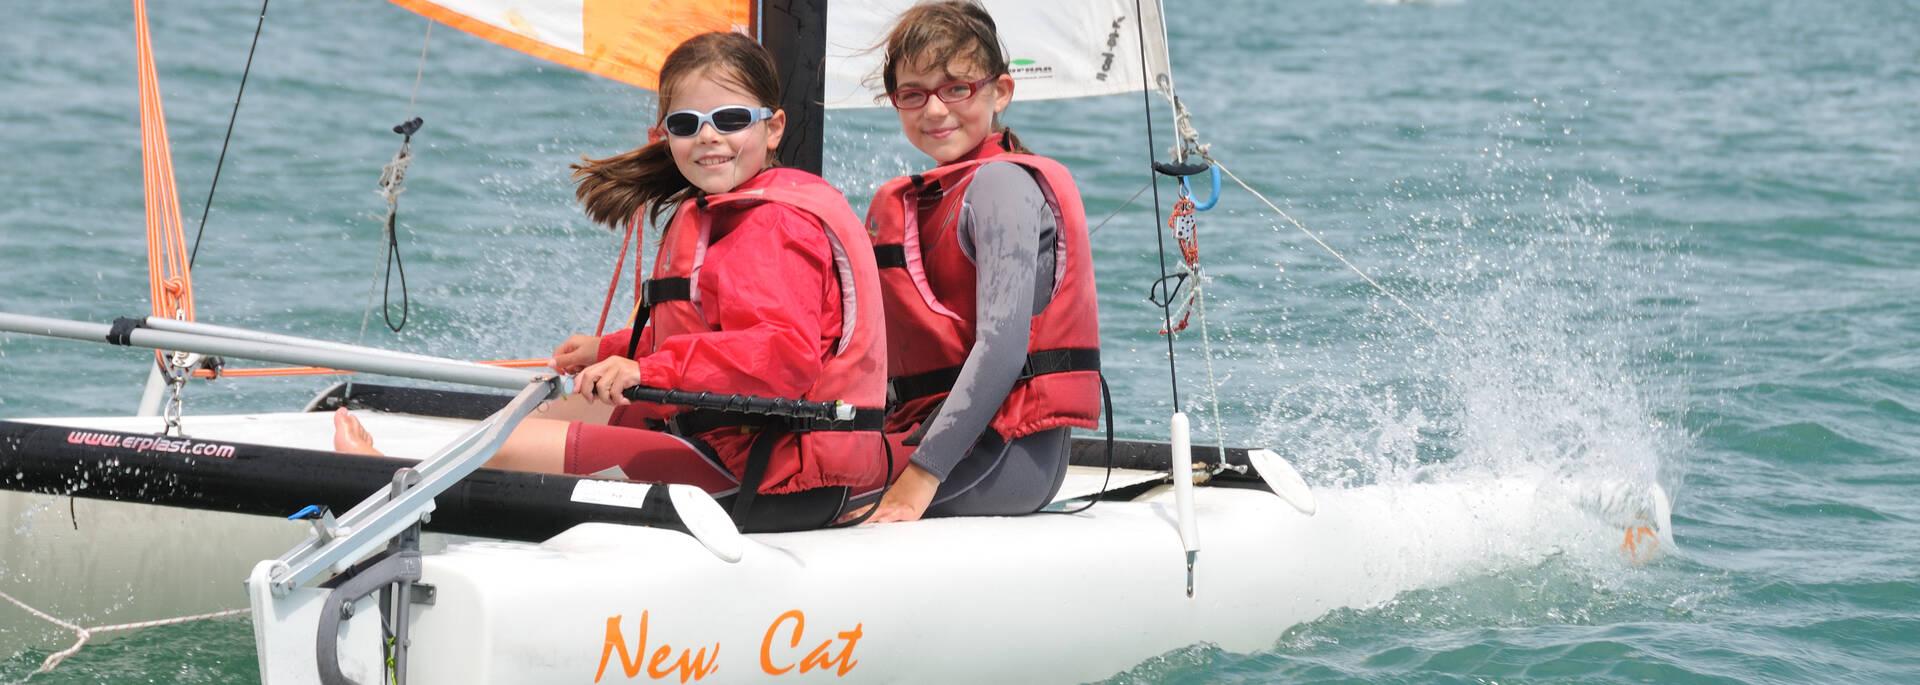 Catamaran initiation de 11 à 13 ans